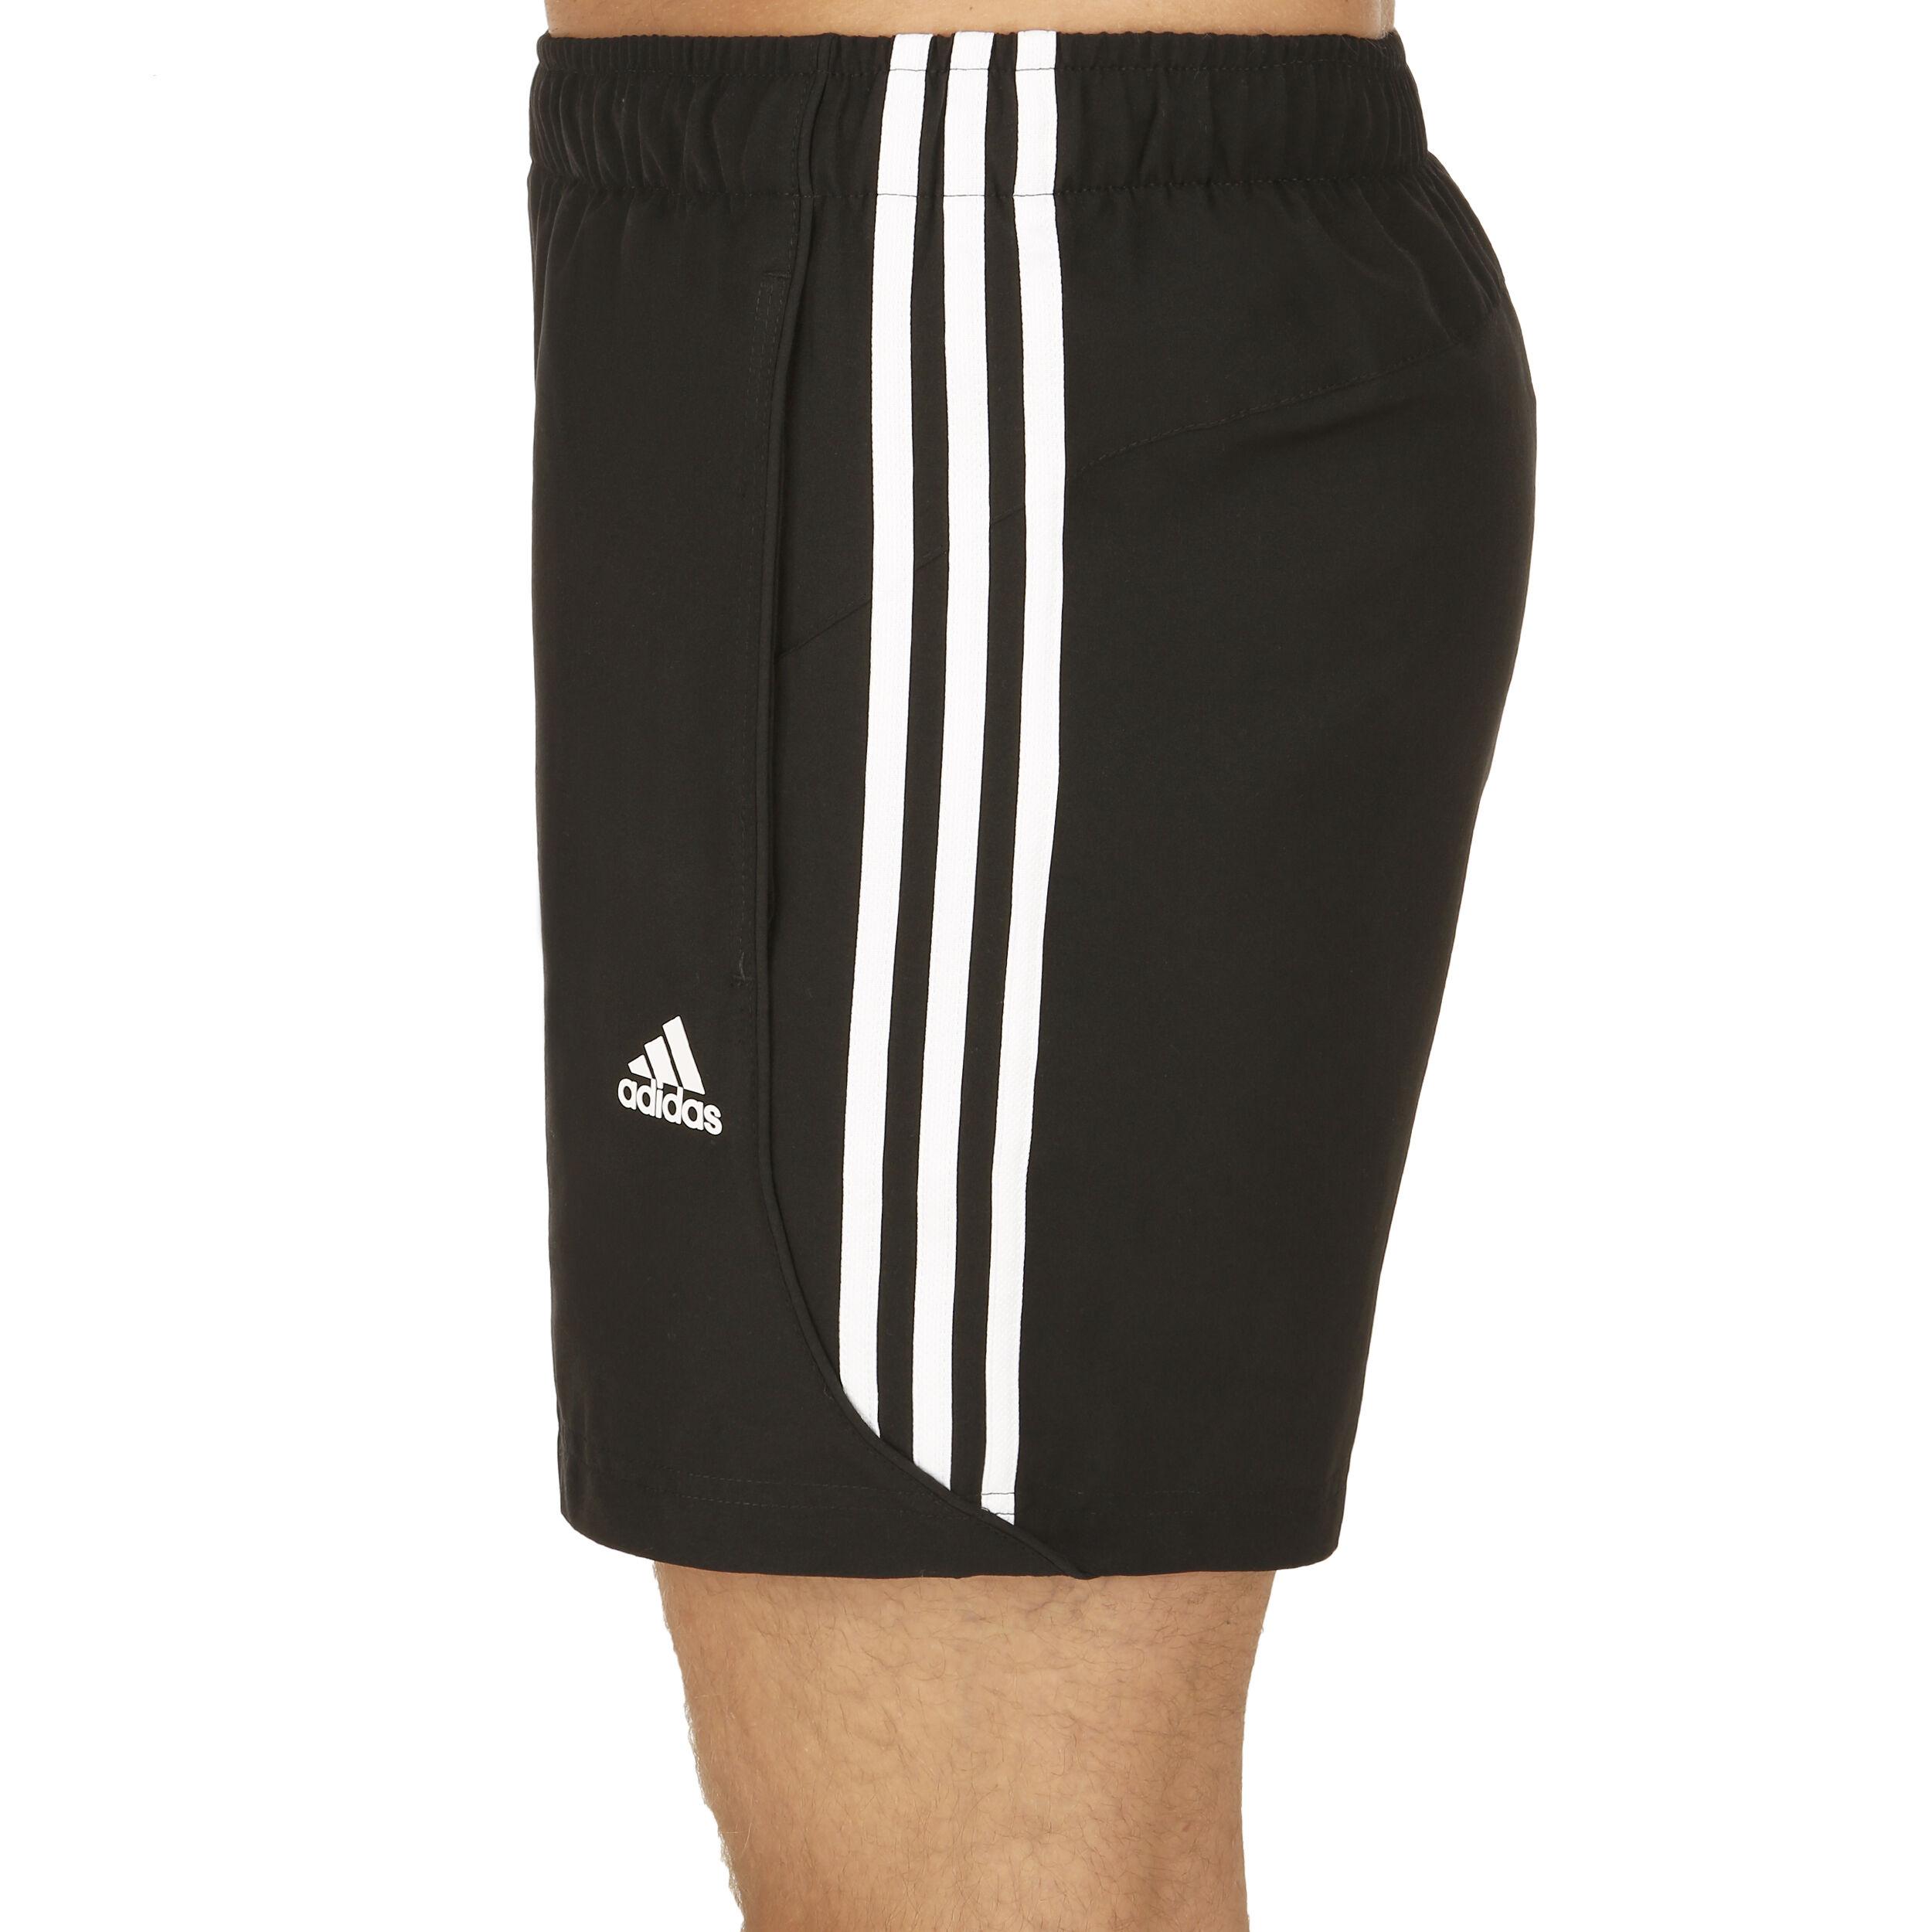 Adidas 3 Stripes Sort Shorts Herre Online